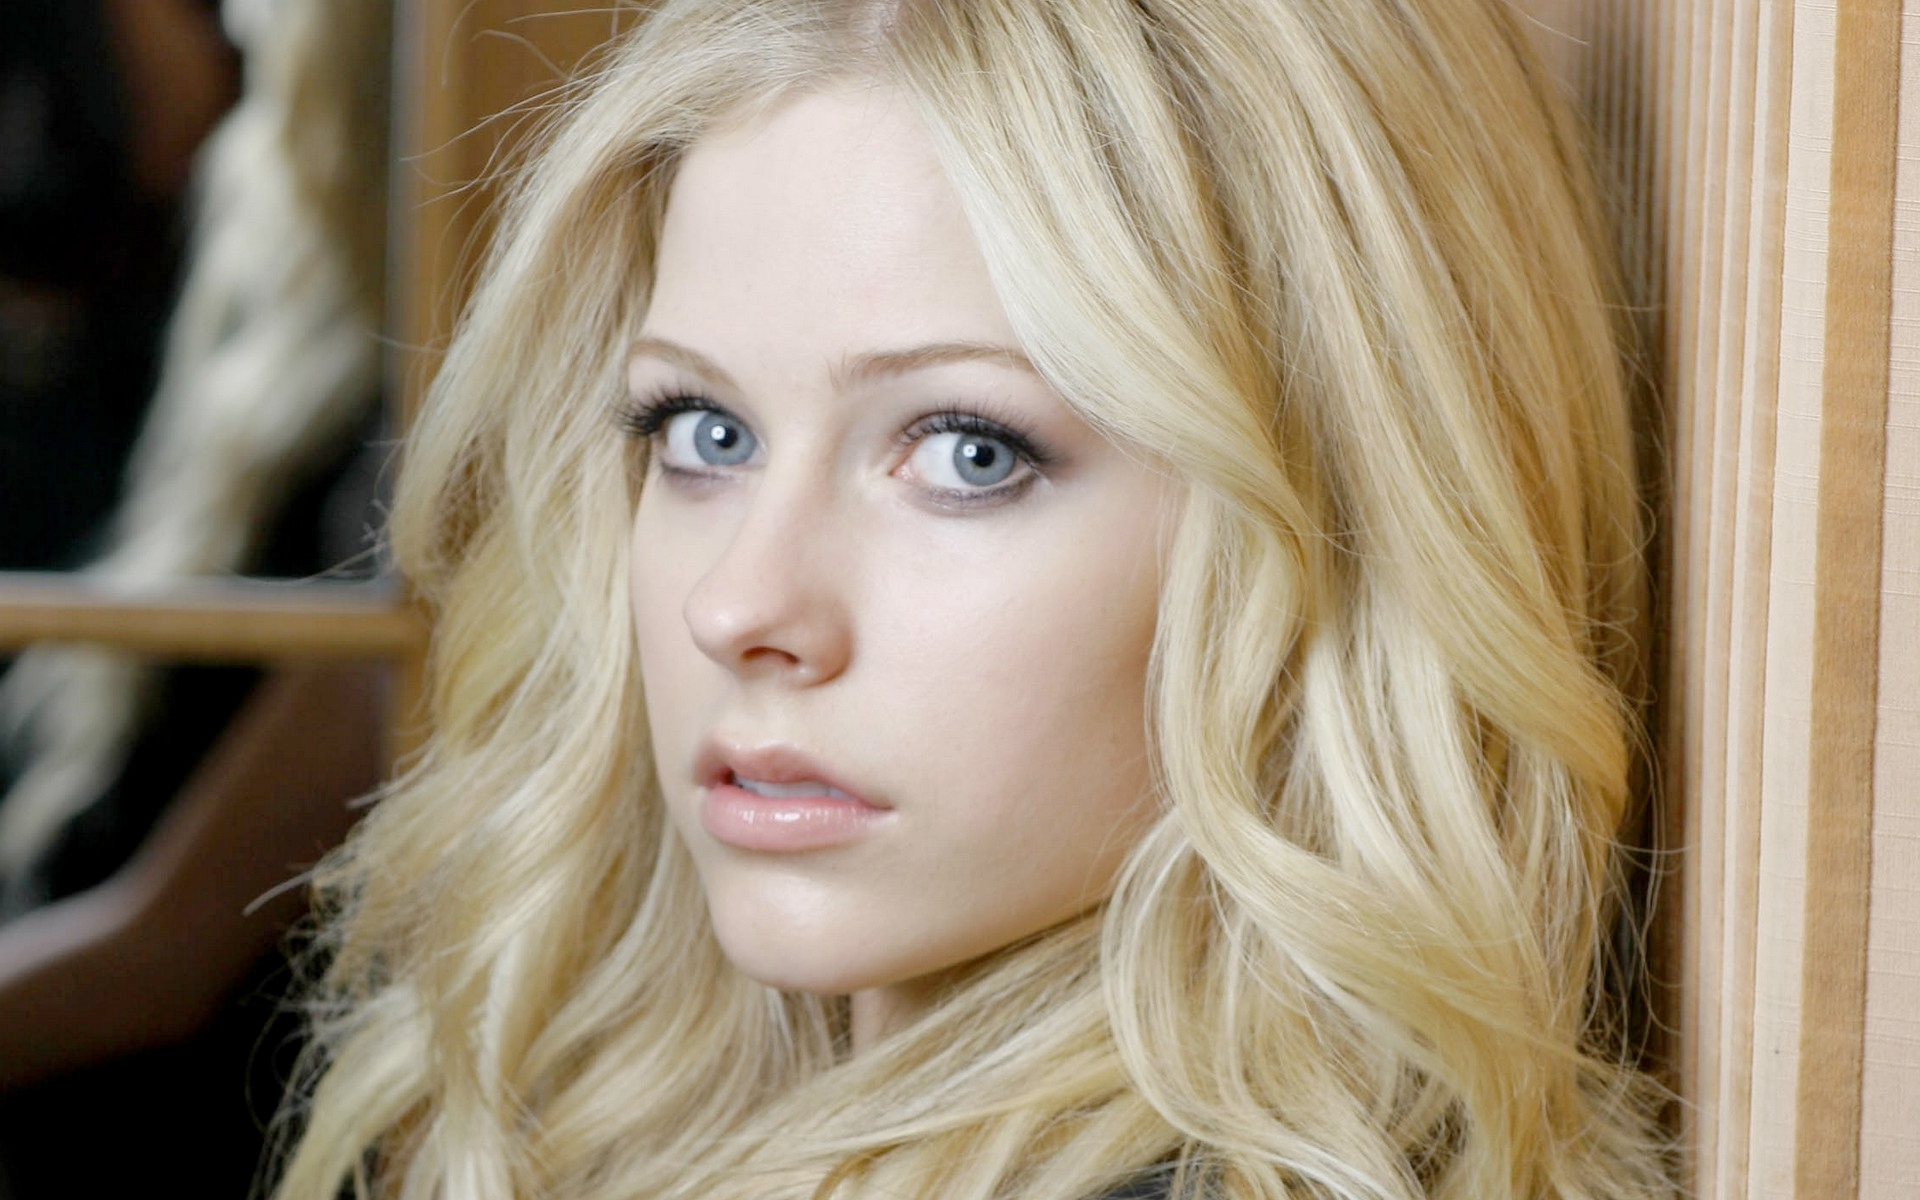 Avril%2dlavigne%2dno%2deyeliner · Avril_lavigne__sony_music_artist_